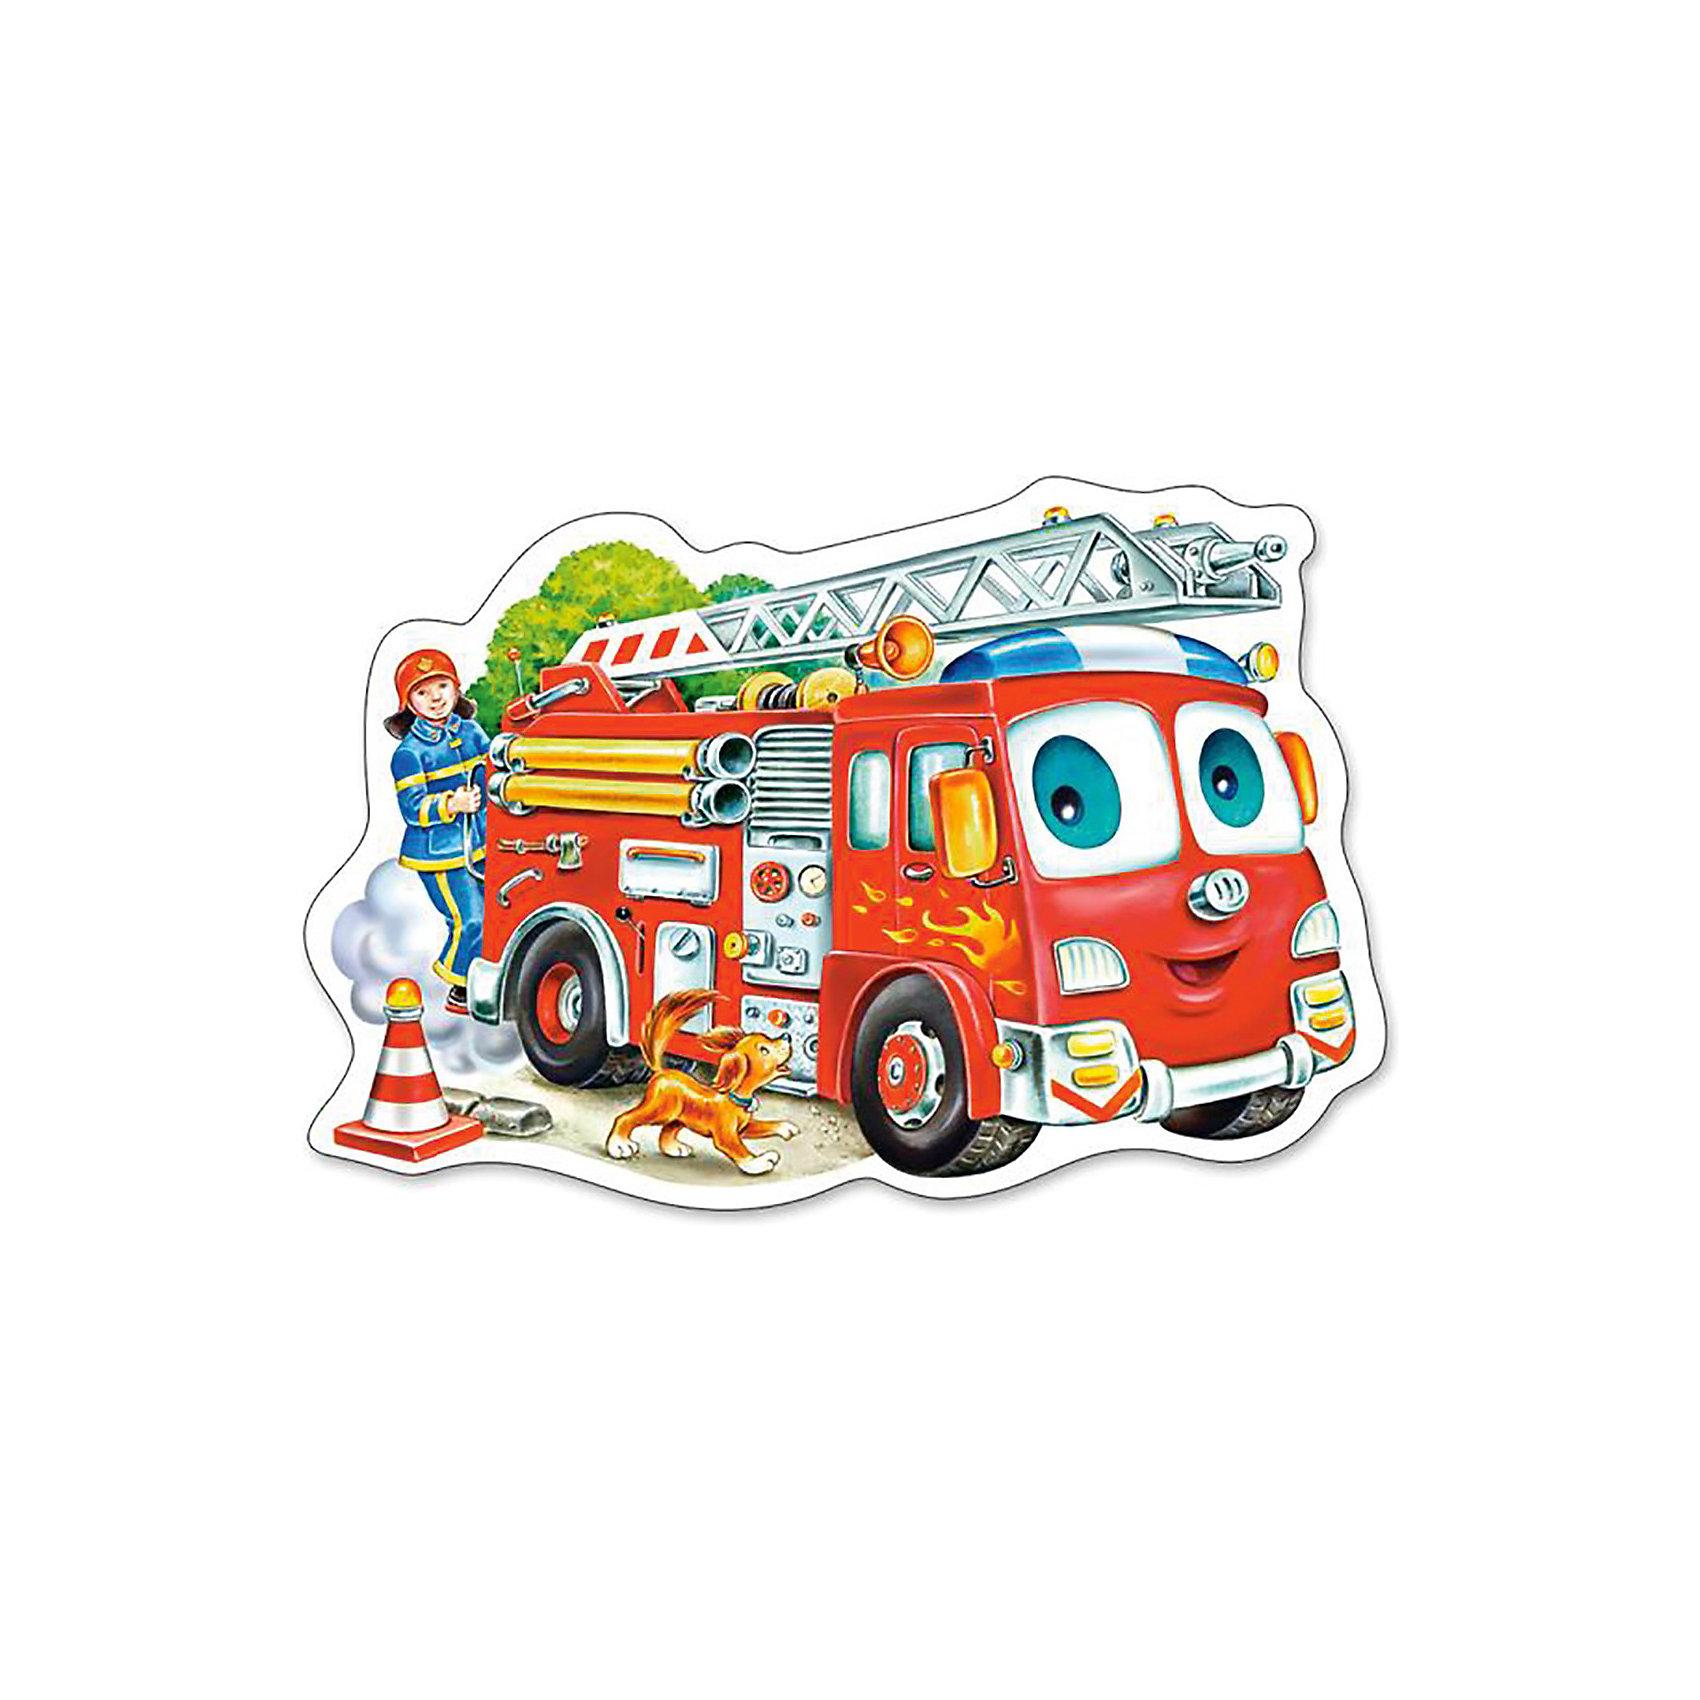 Castorland Пазл Пожарная машина, 15 деталей, Castorland castorland пазл красная шапочка castorland 20 деталей